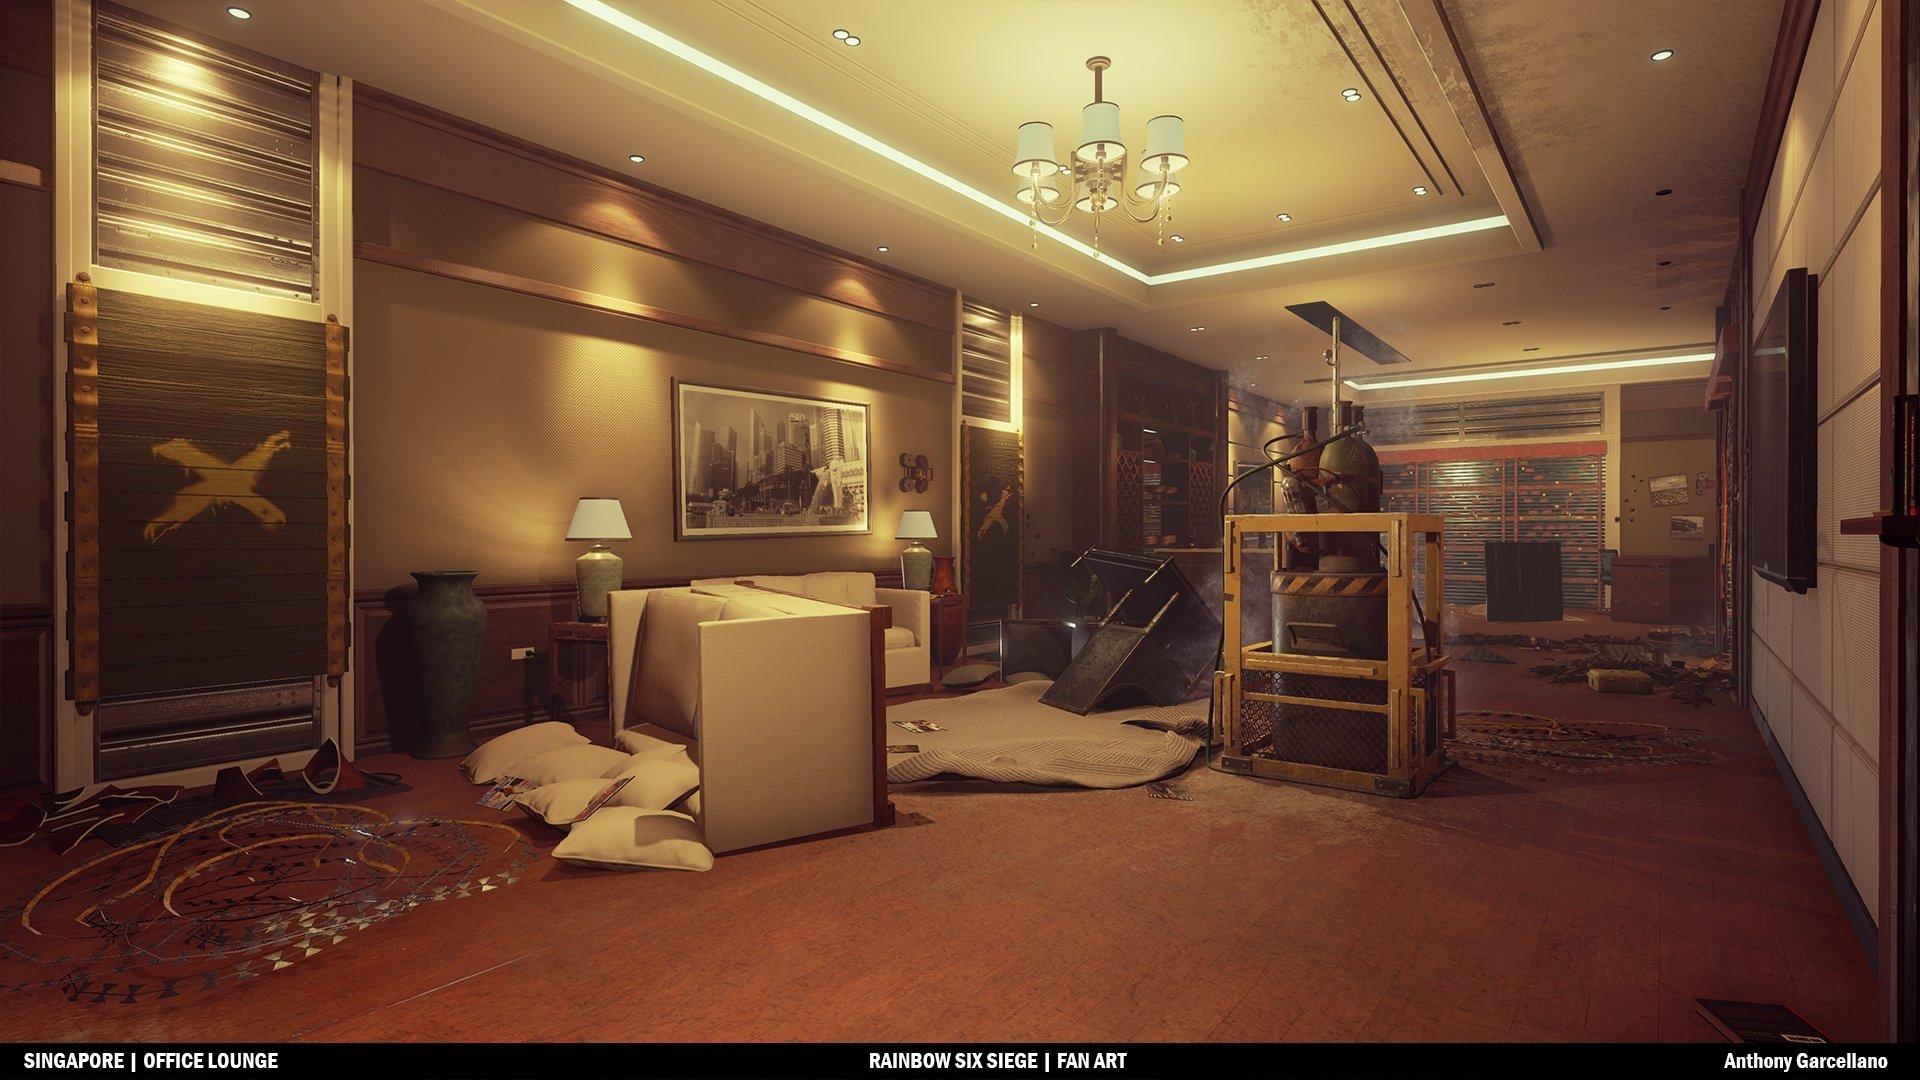 UE4] Office Lounge (Rainbow Six Siege Inspired Scene